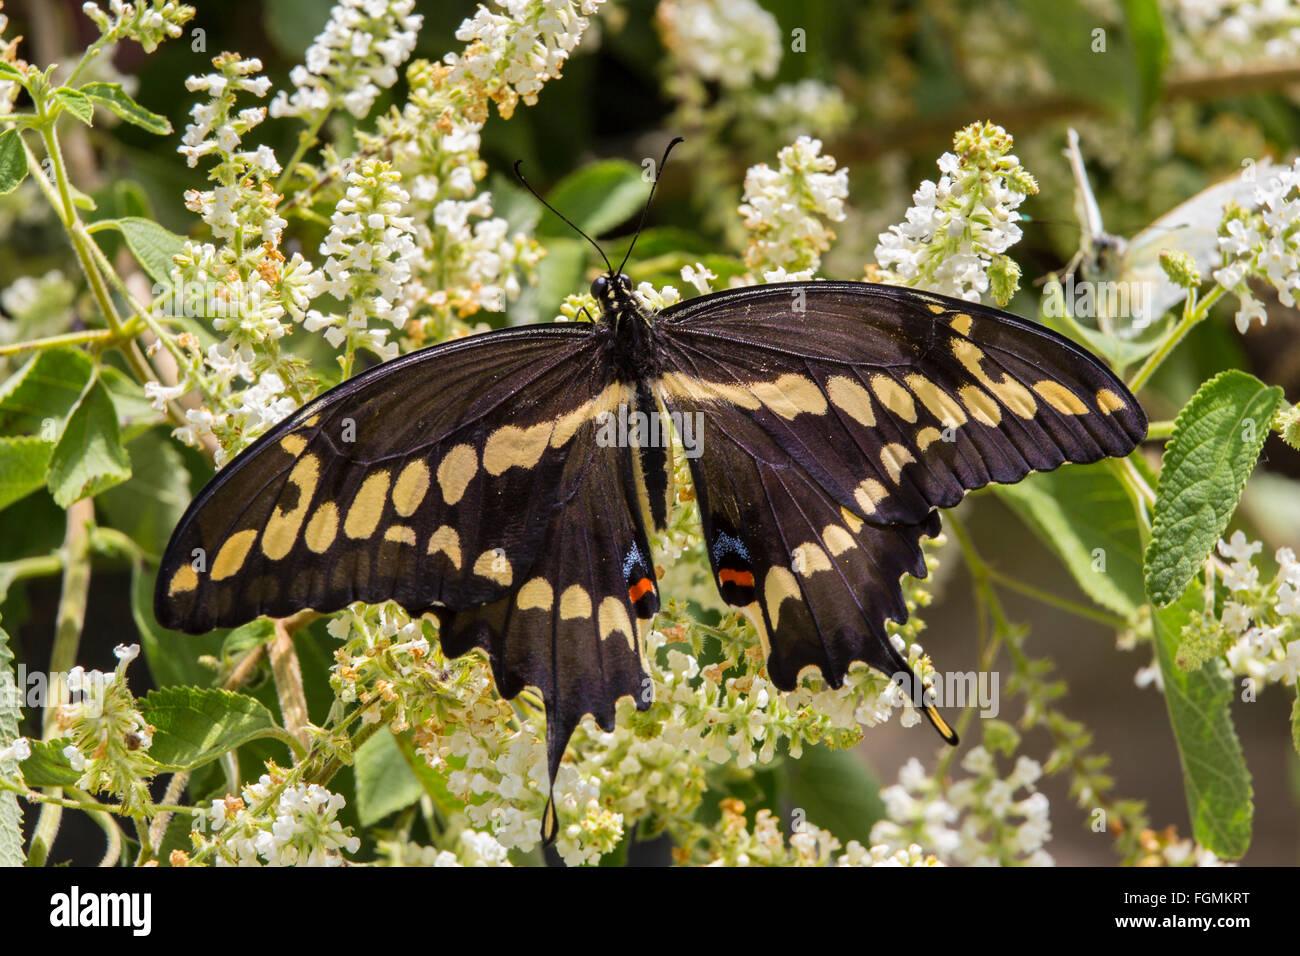 Especie gigante mariposa Papilio cresphontes en las fincas de mariposas en Fort Myers Florida Foto de stock